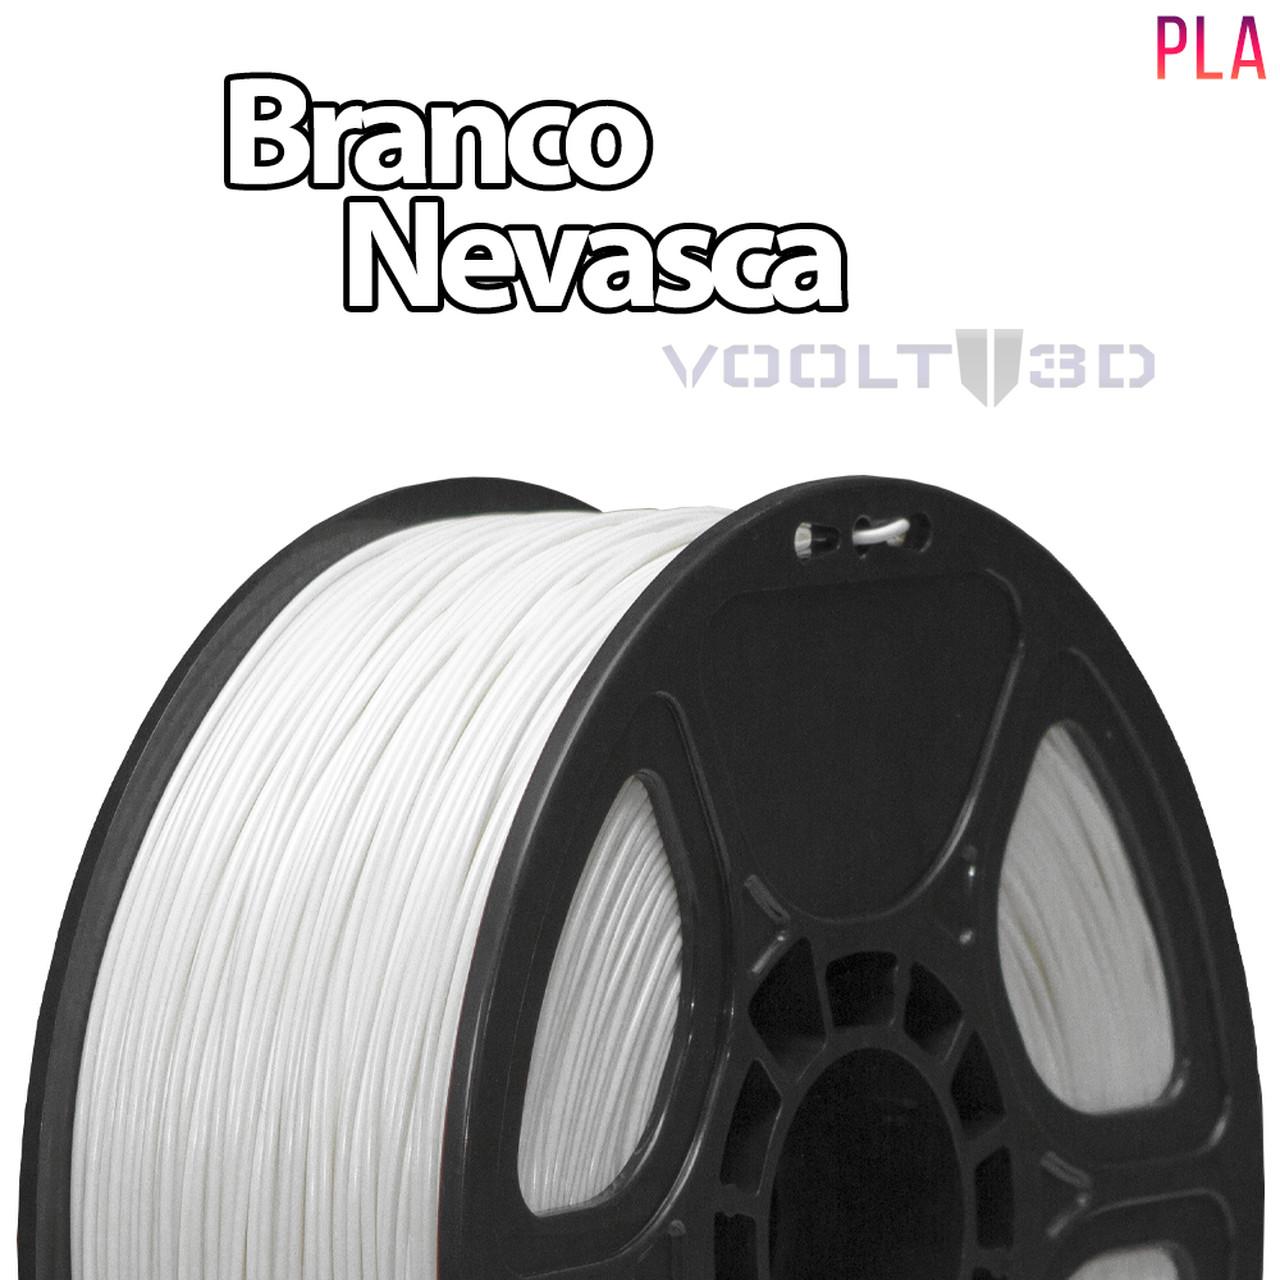 Filamento PLA - Branco Nevasca - Voolt - 1.75mm - 1kg